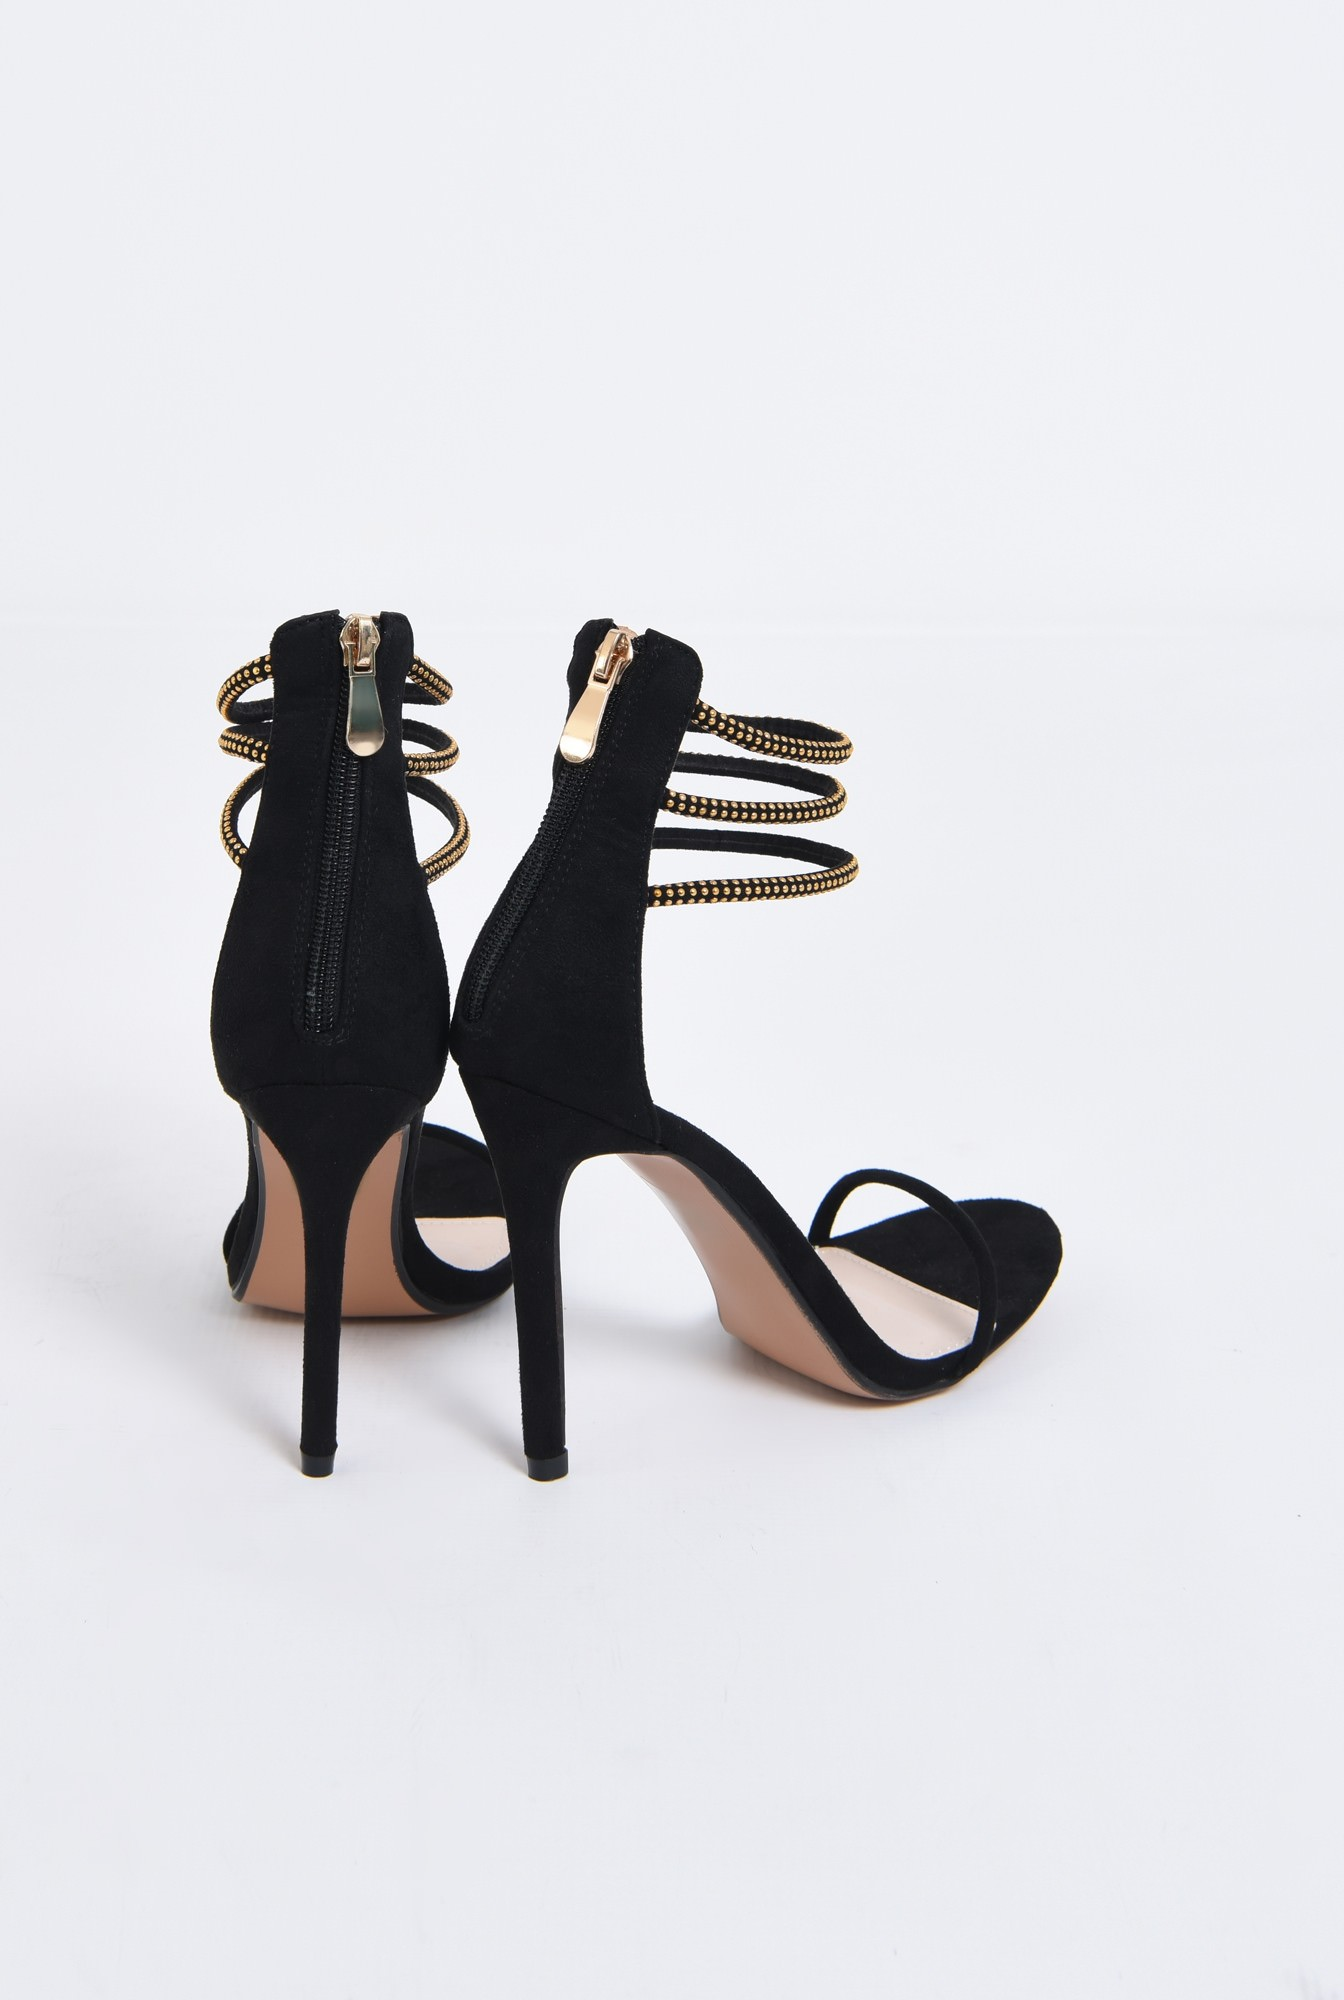 2 - sandale elegante, negre, toc inalt, barete cu aplicatii metalice